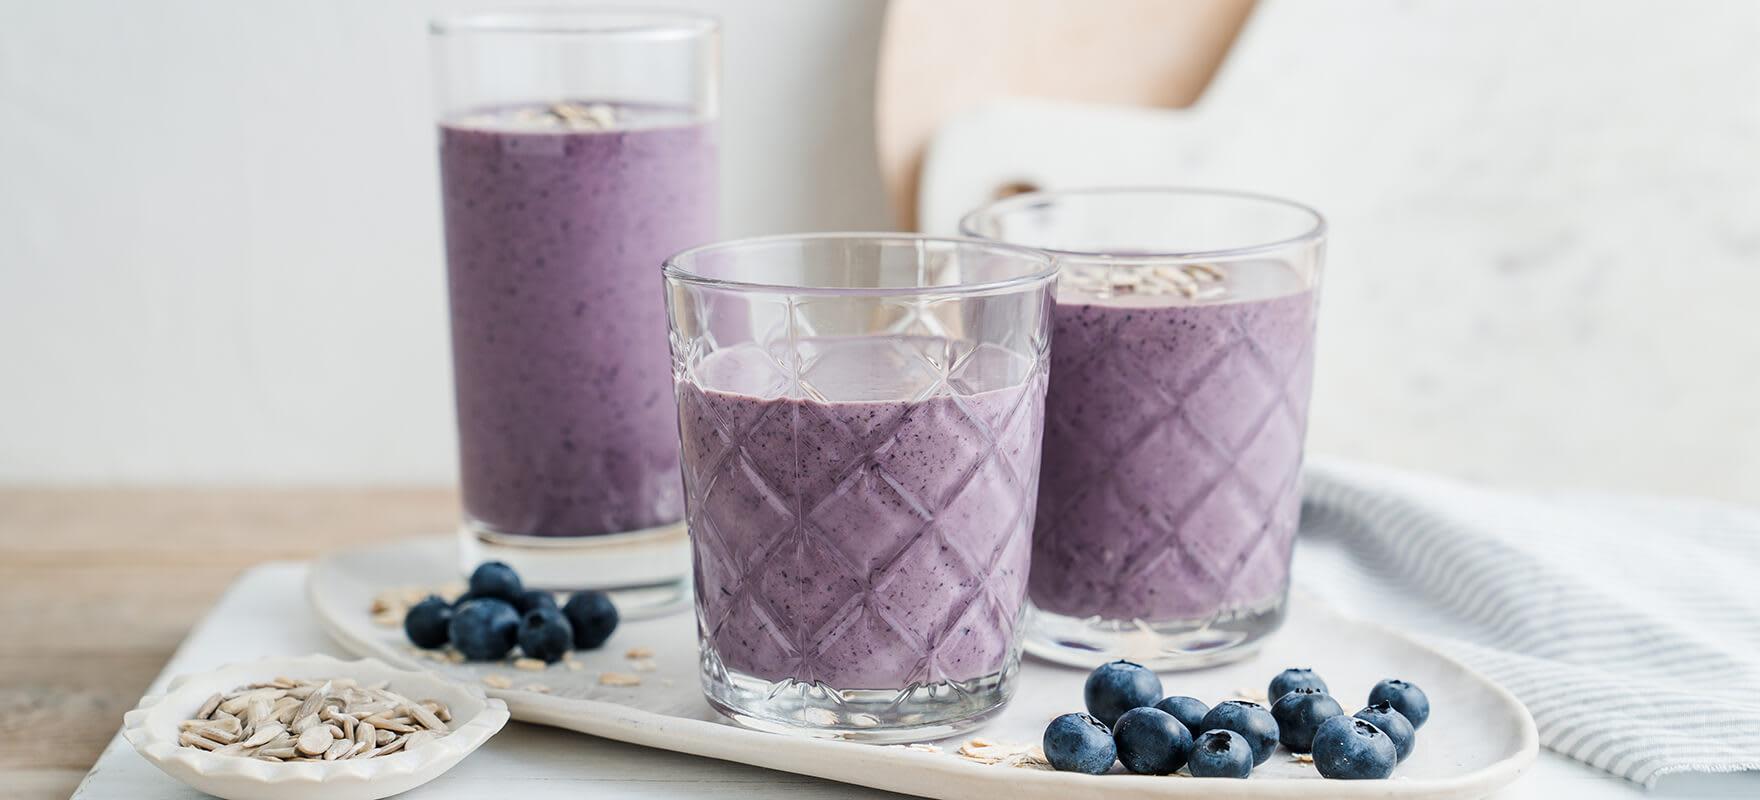 Blueberry, cinnamon & oat smoothie image 1